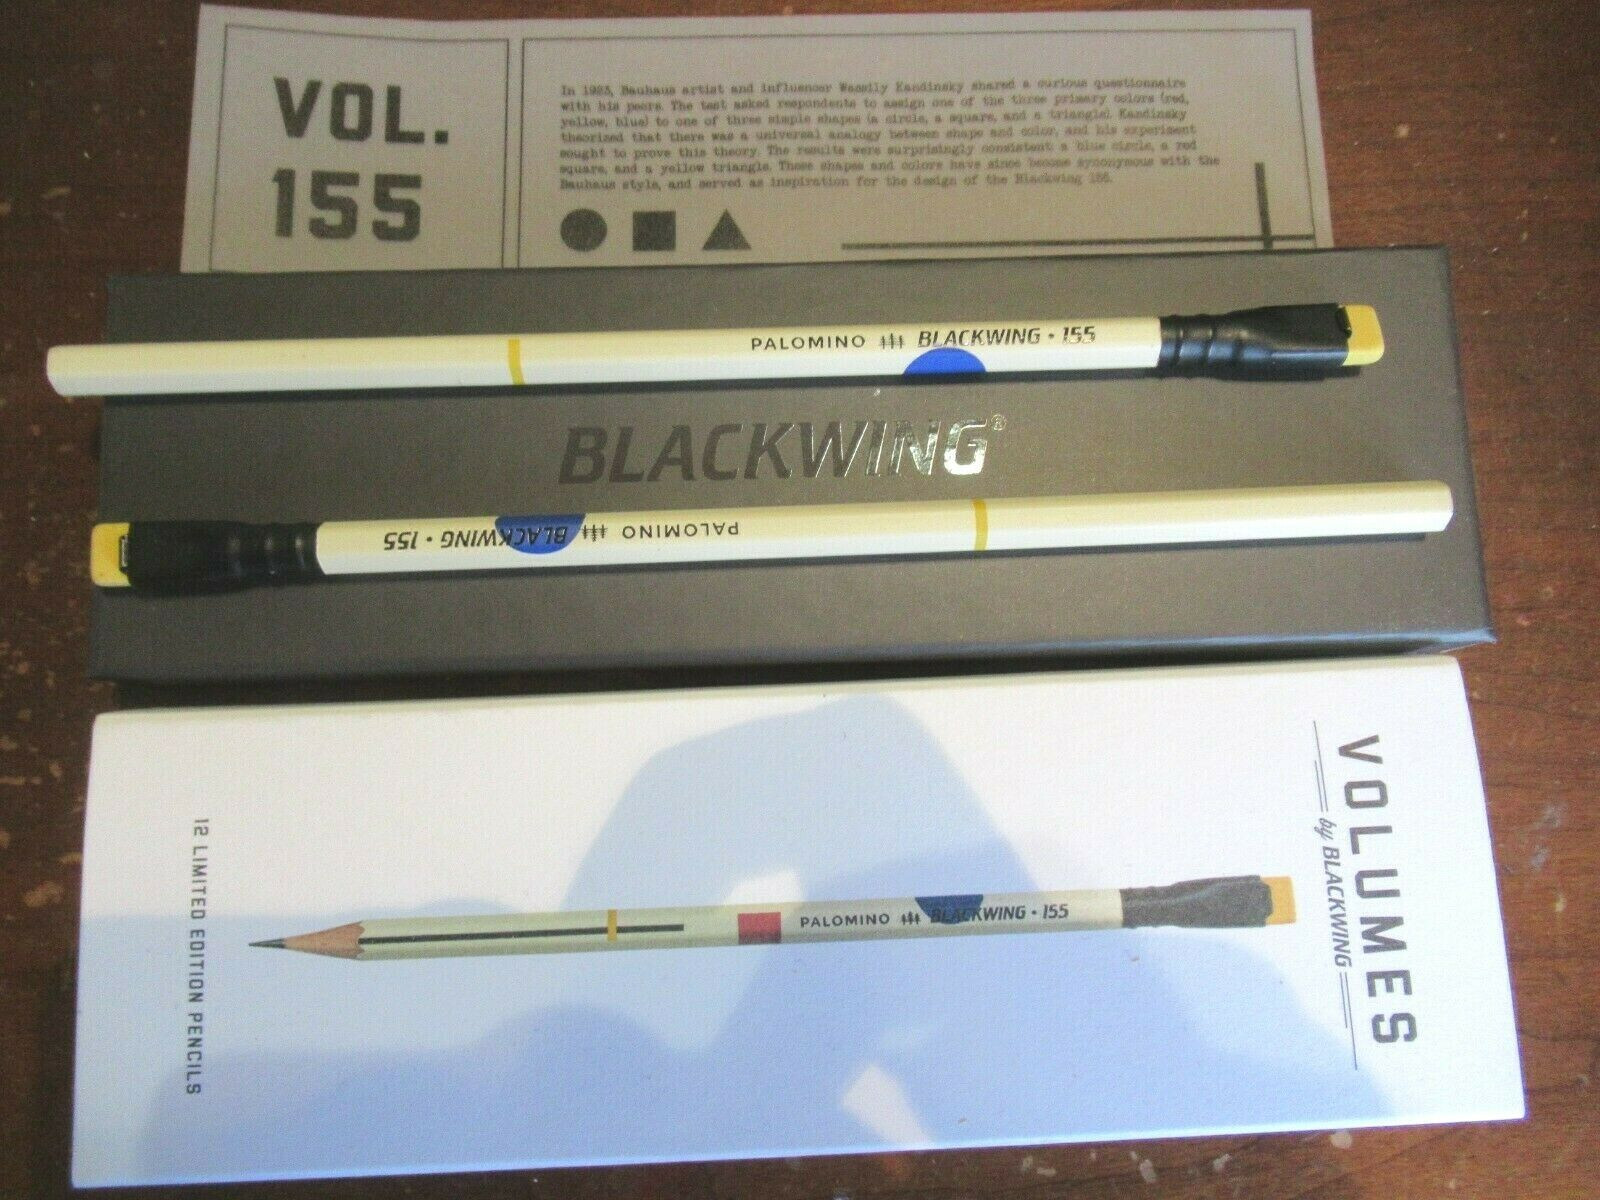 Palomino Blackwing Volume 10 limited edition single pencil